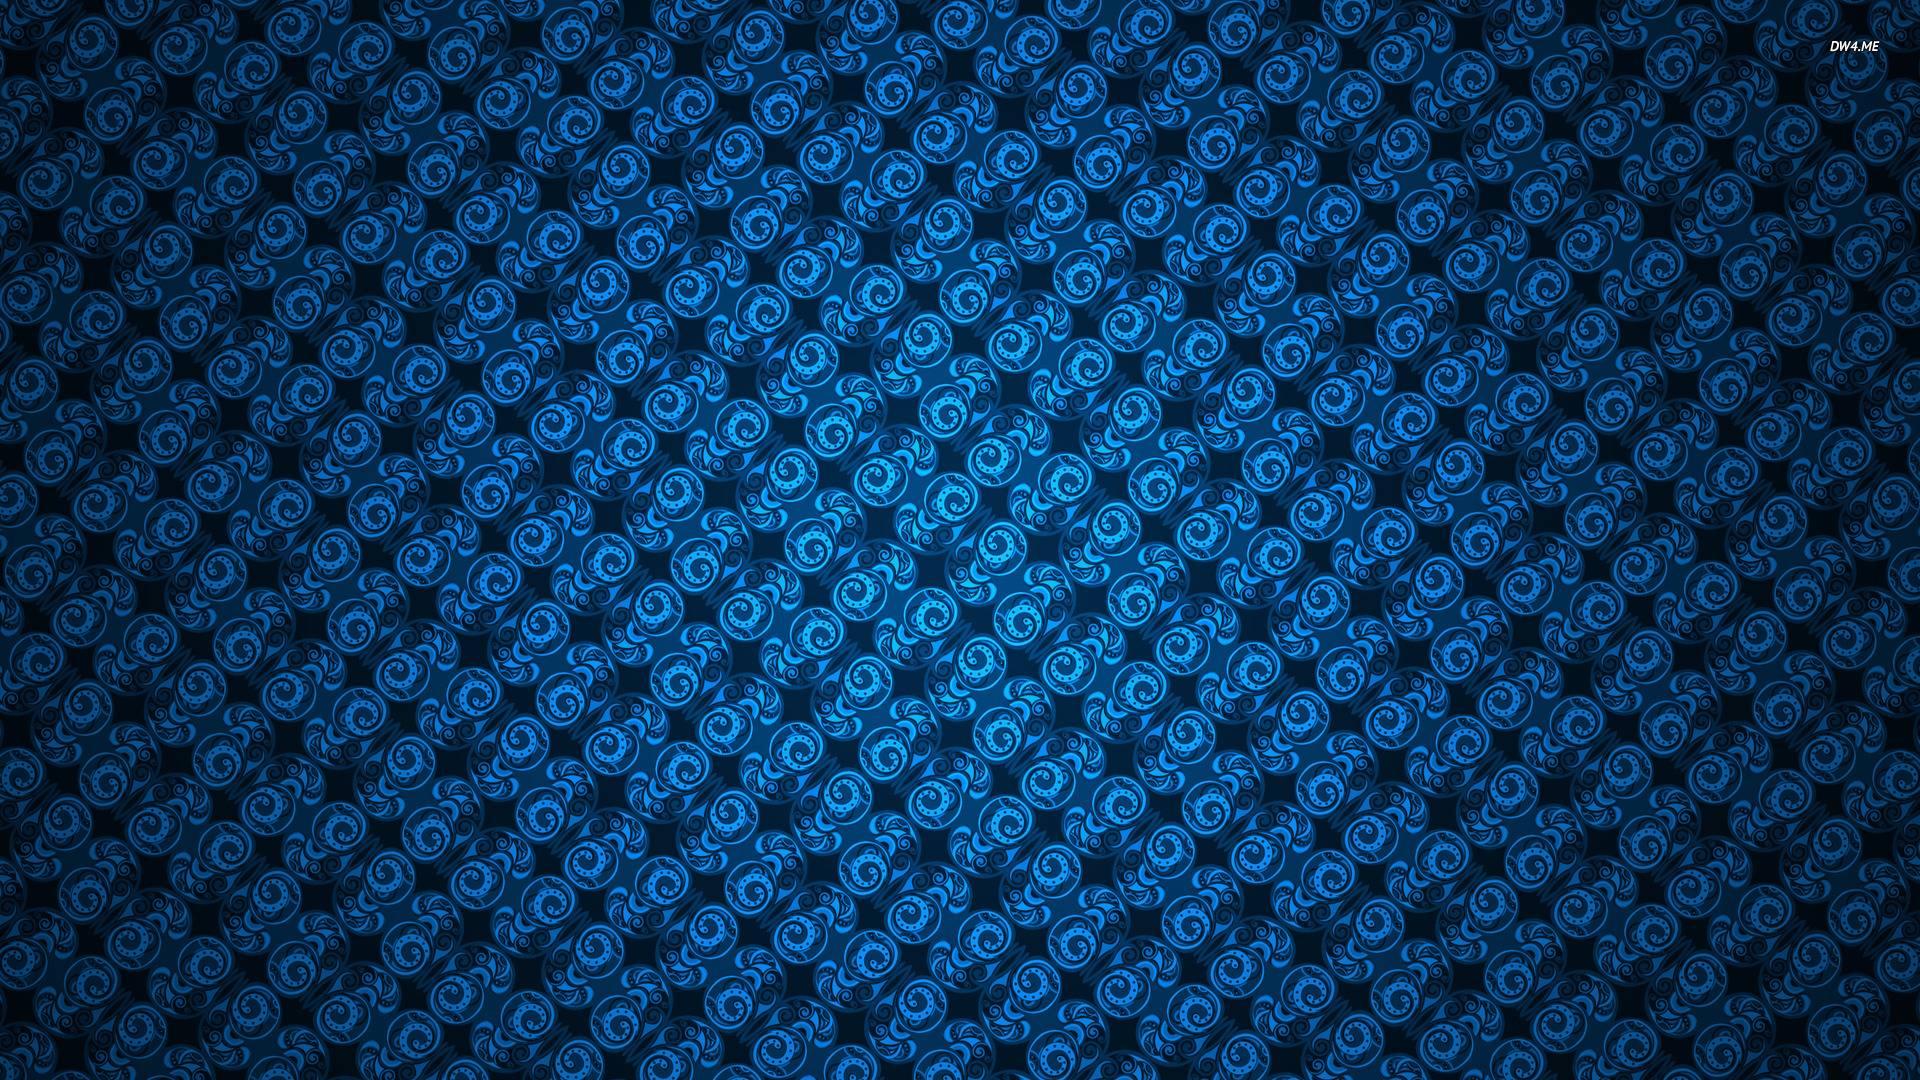 swirling royal pattern wallpaper - photo #2